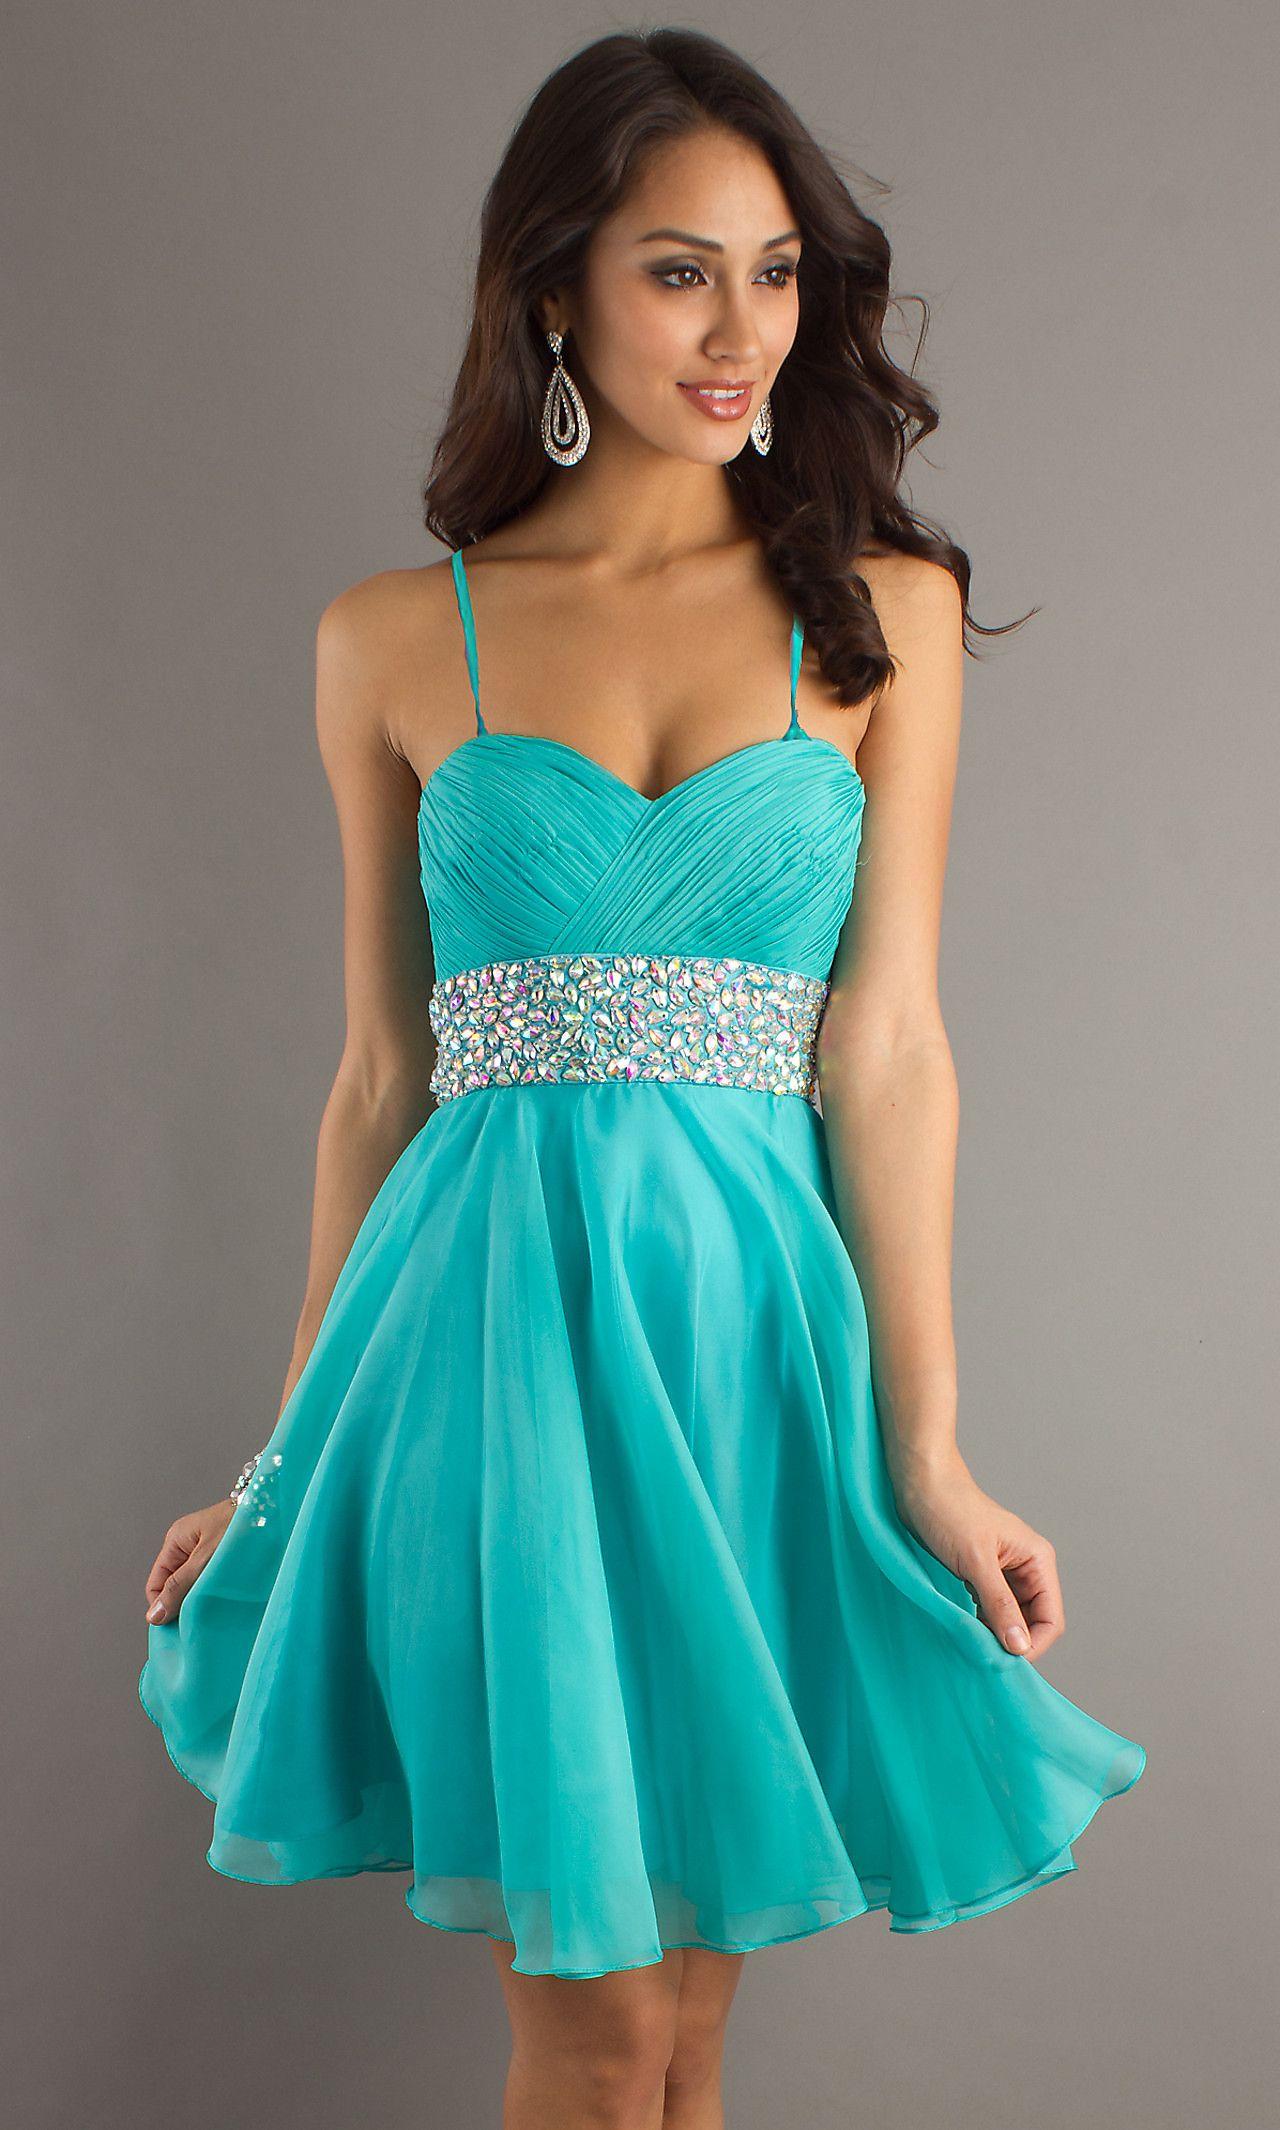 Aqua blue...reminds me of Princess Jasmine | teen fashion ...